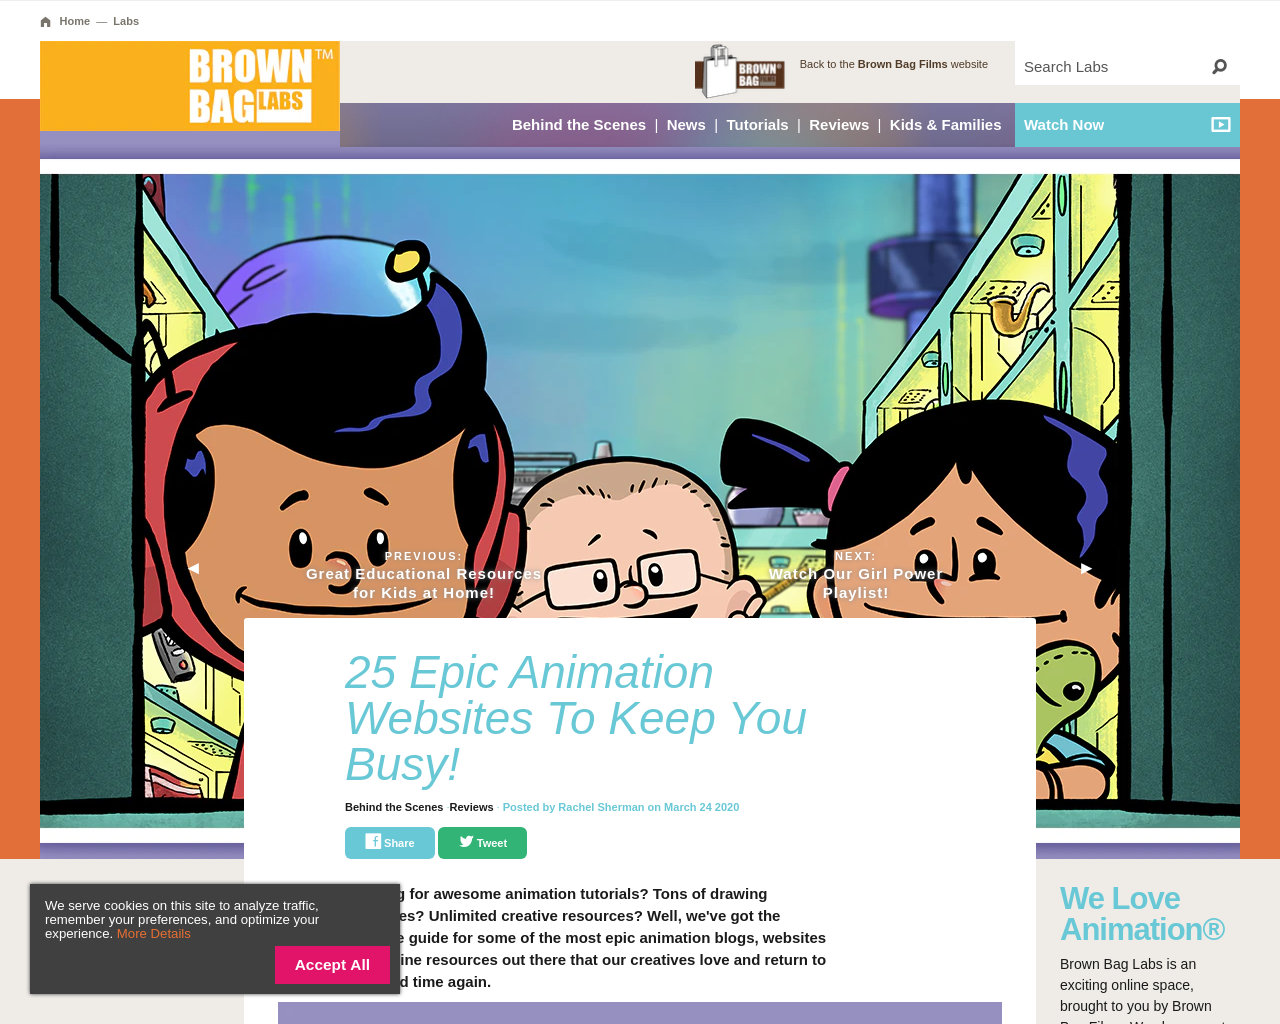 Animation websites from Brown Bag films